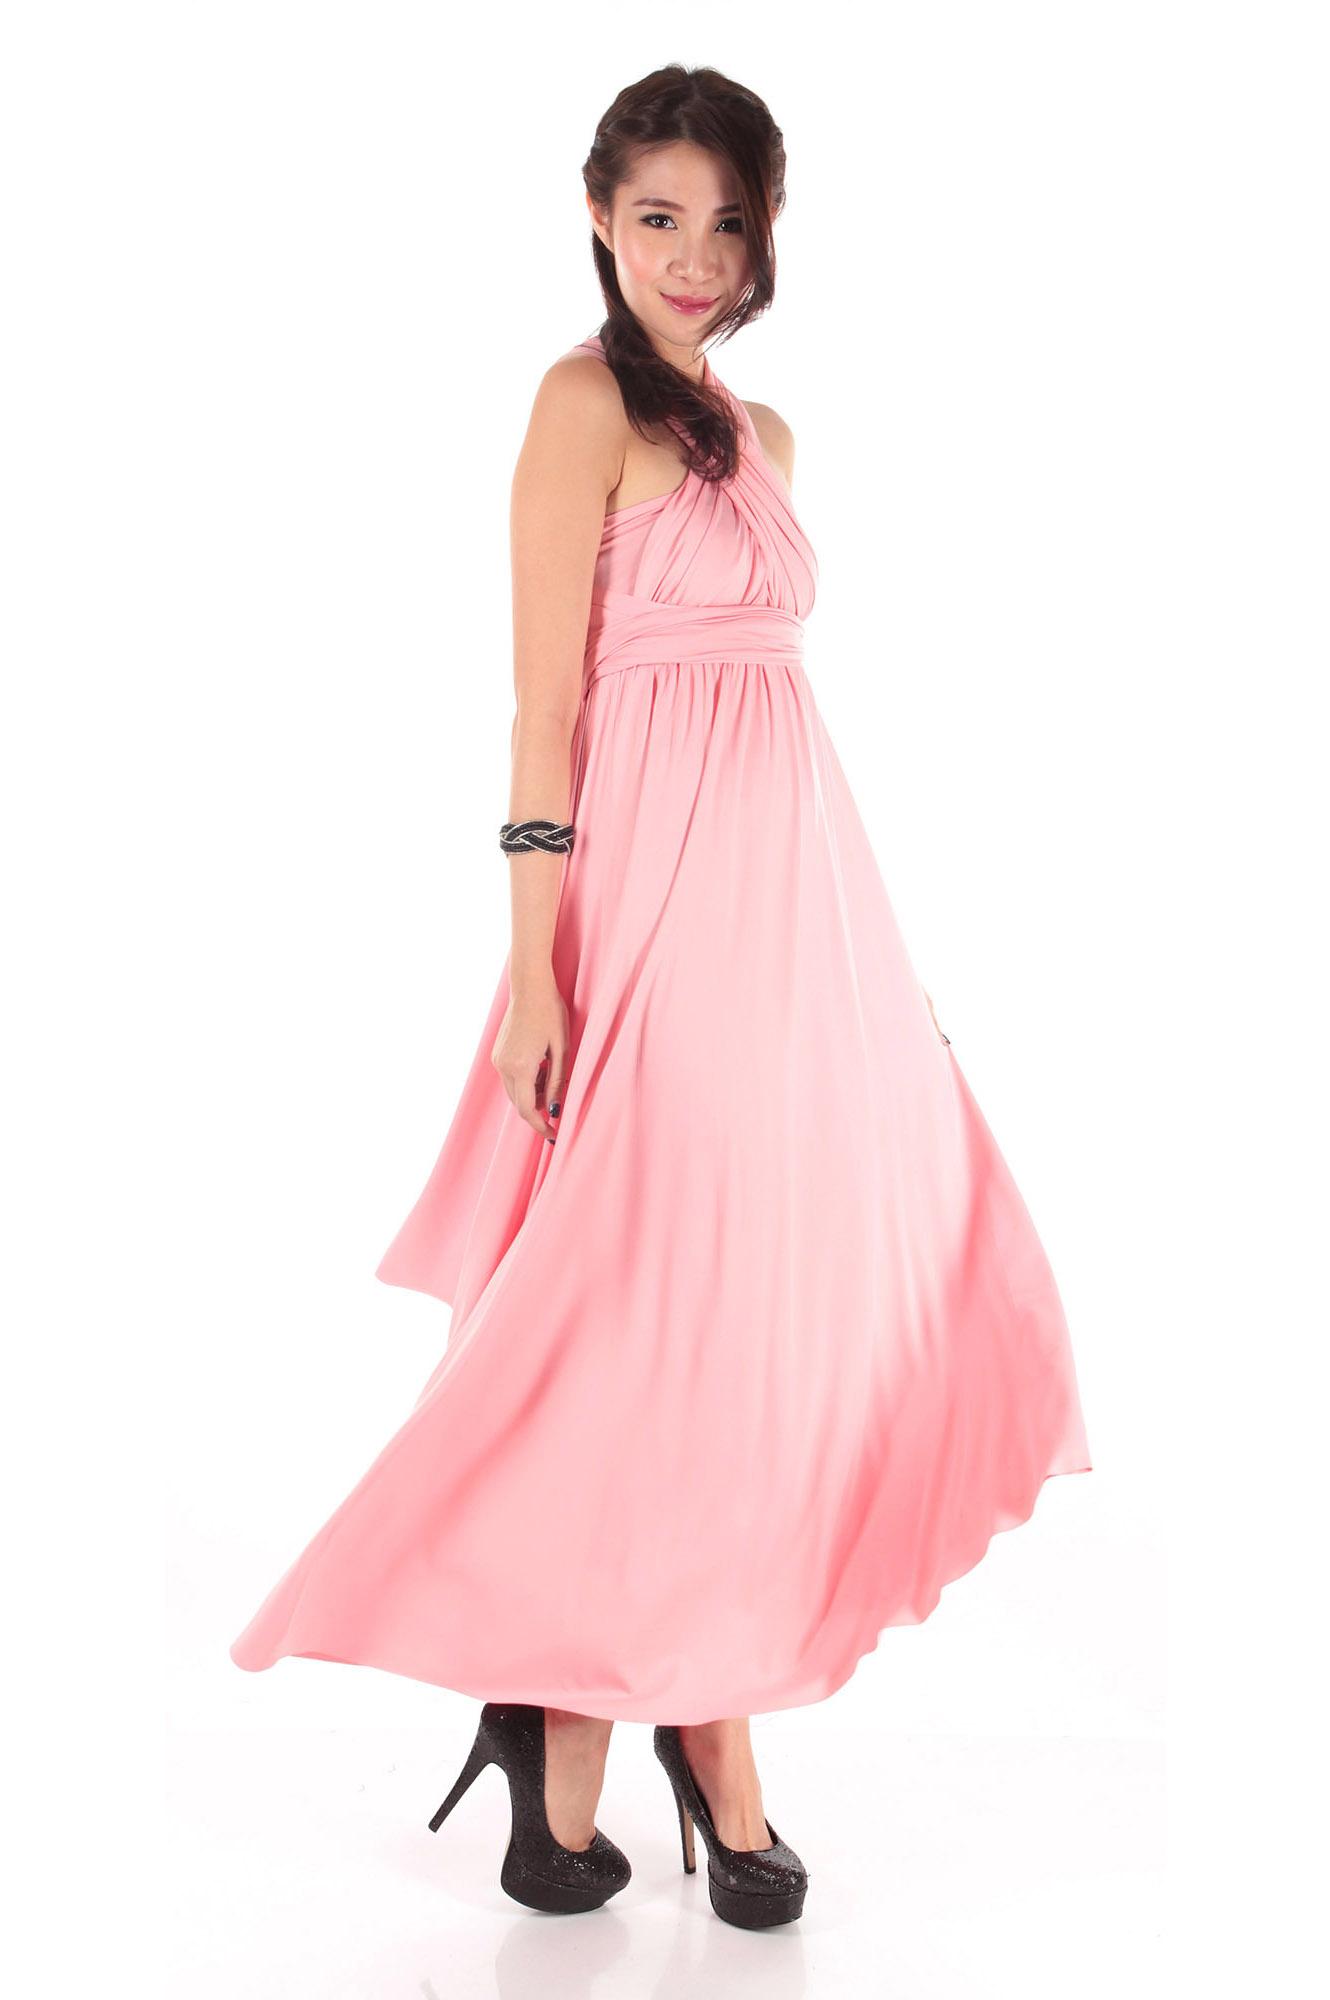 Bridesmaid Dresses Maxi by Dressabelle Indonesia   Bridestory.com